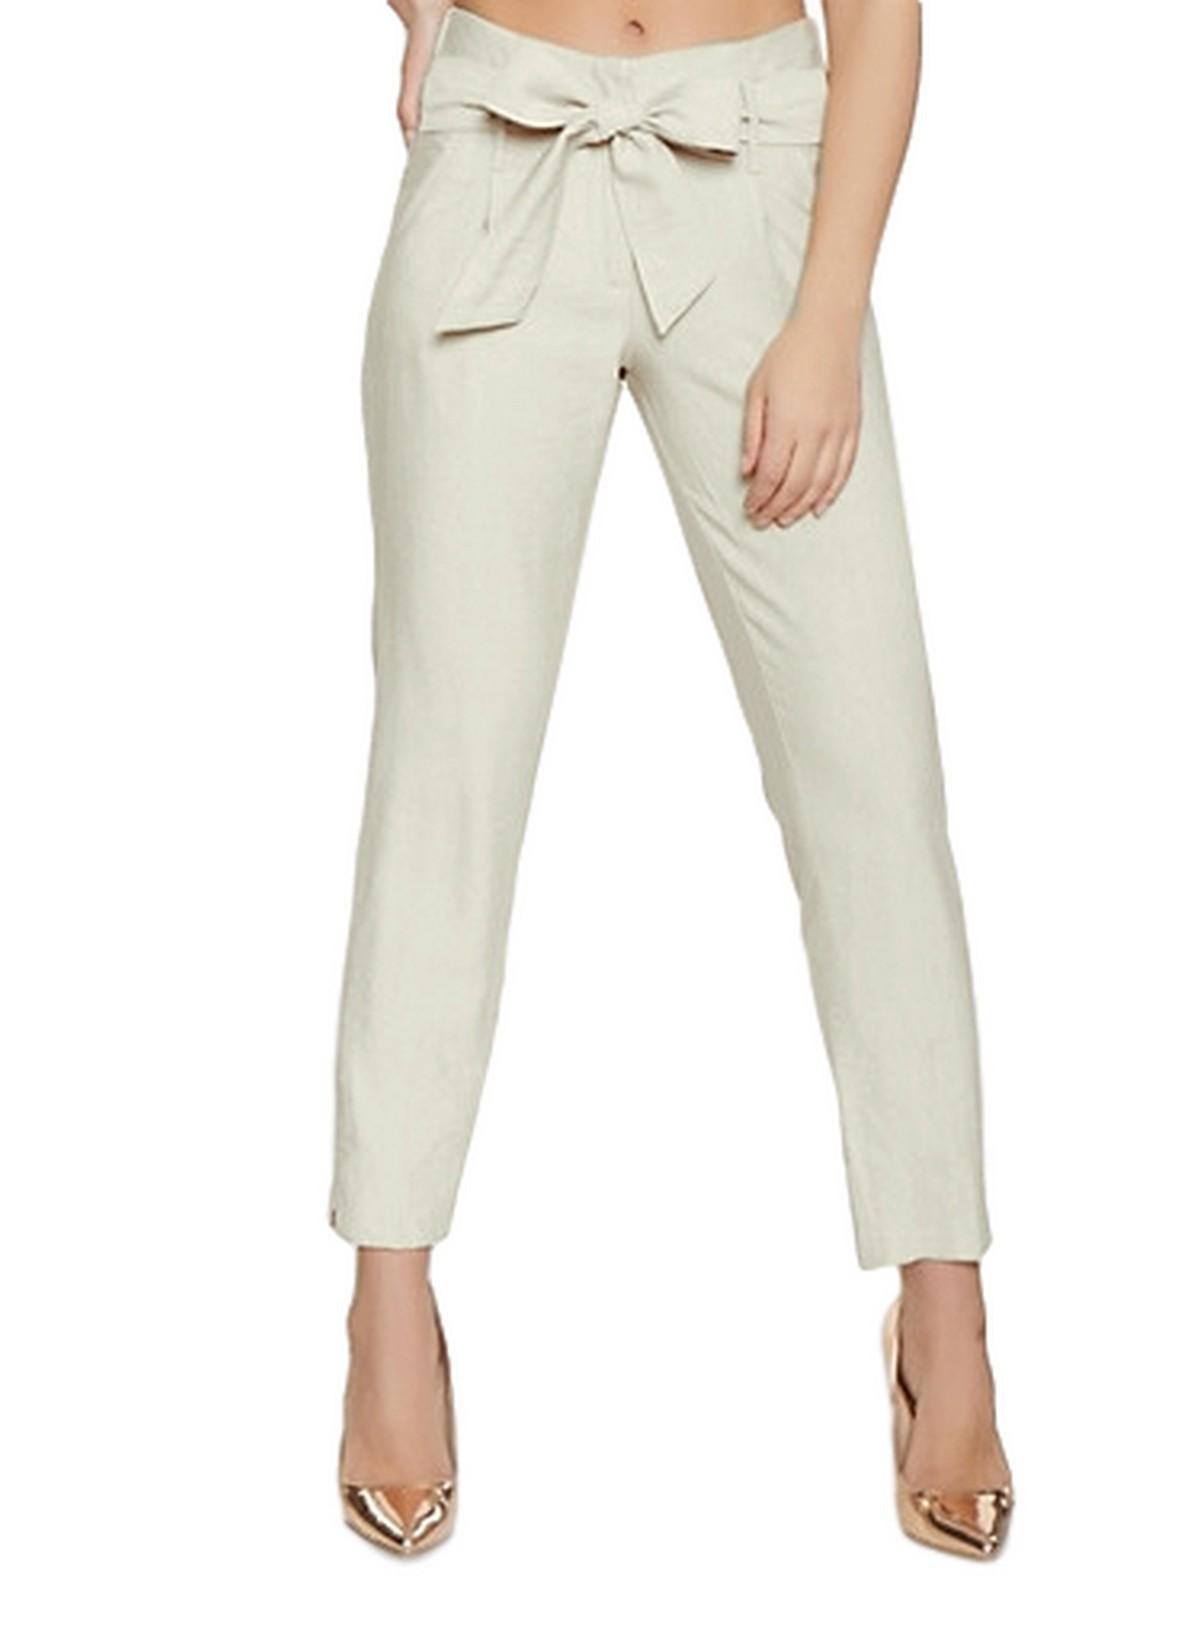 Slim Fit Cigarette Trousers in Off-White